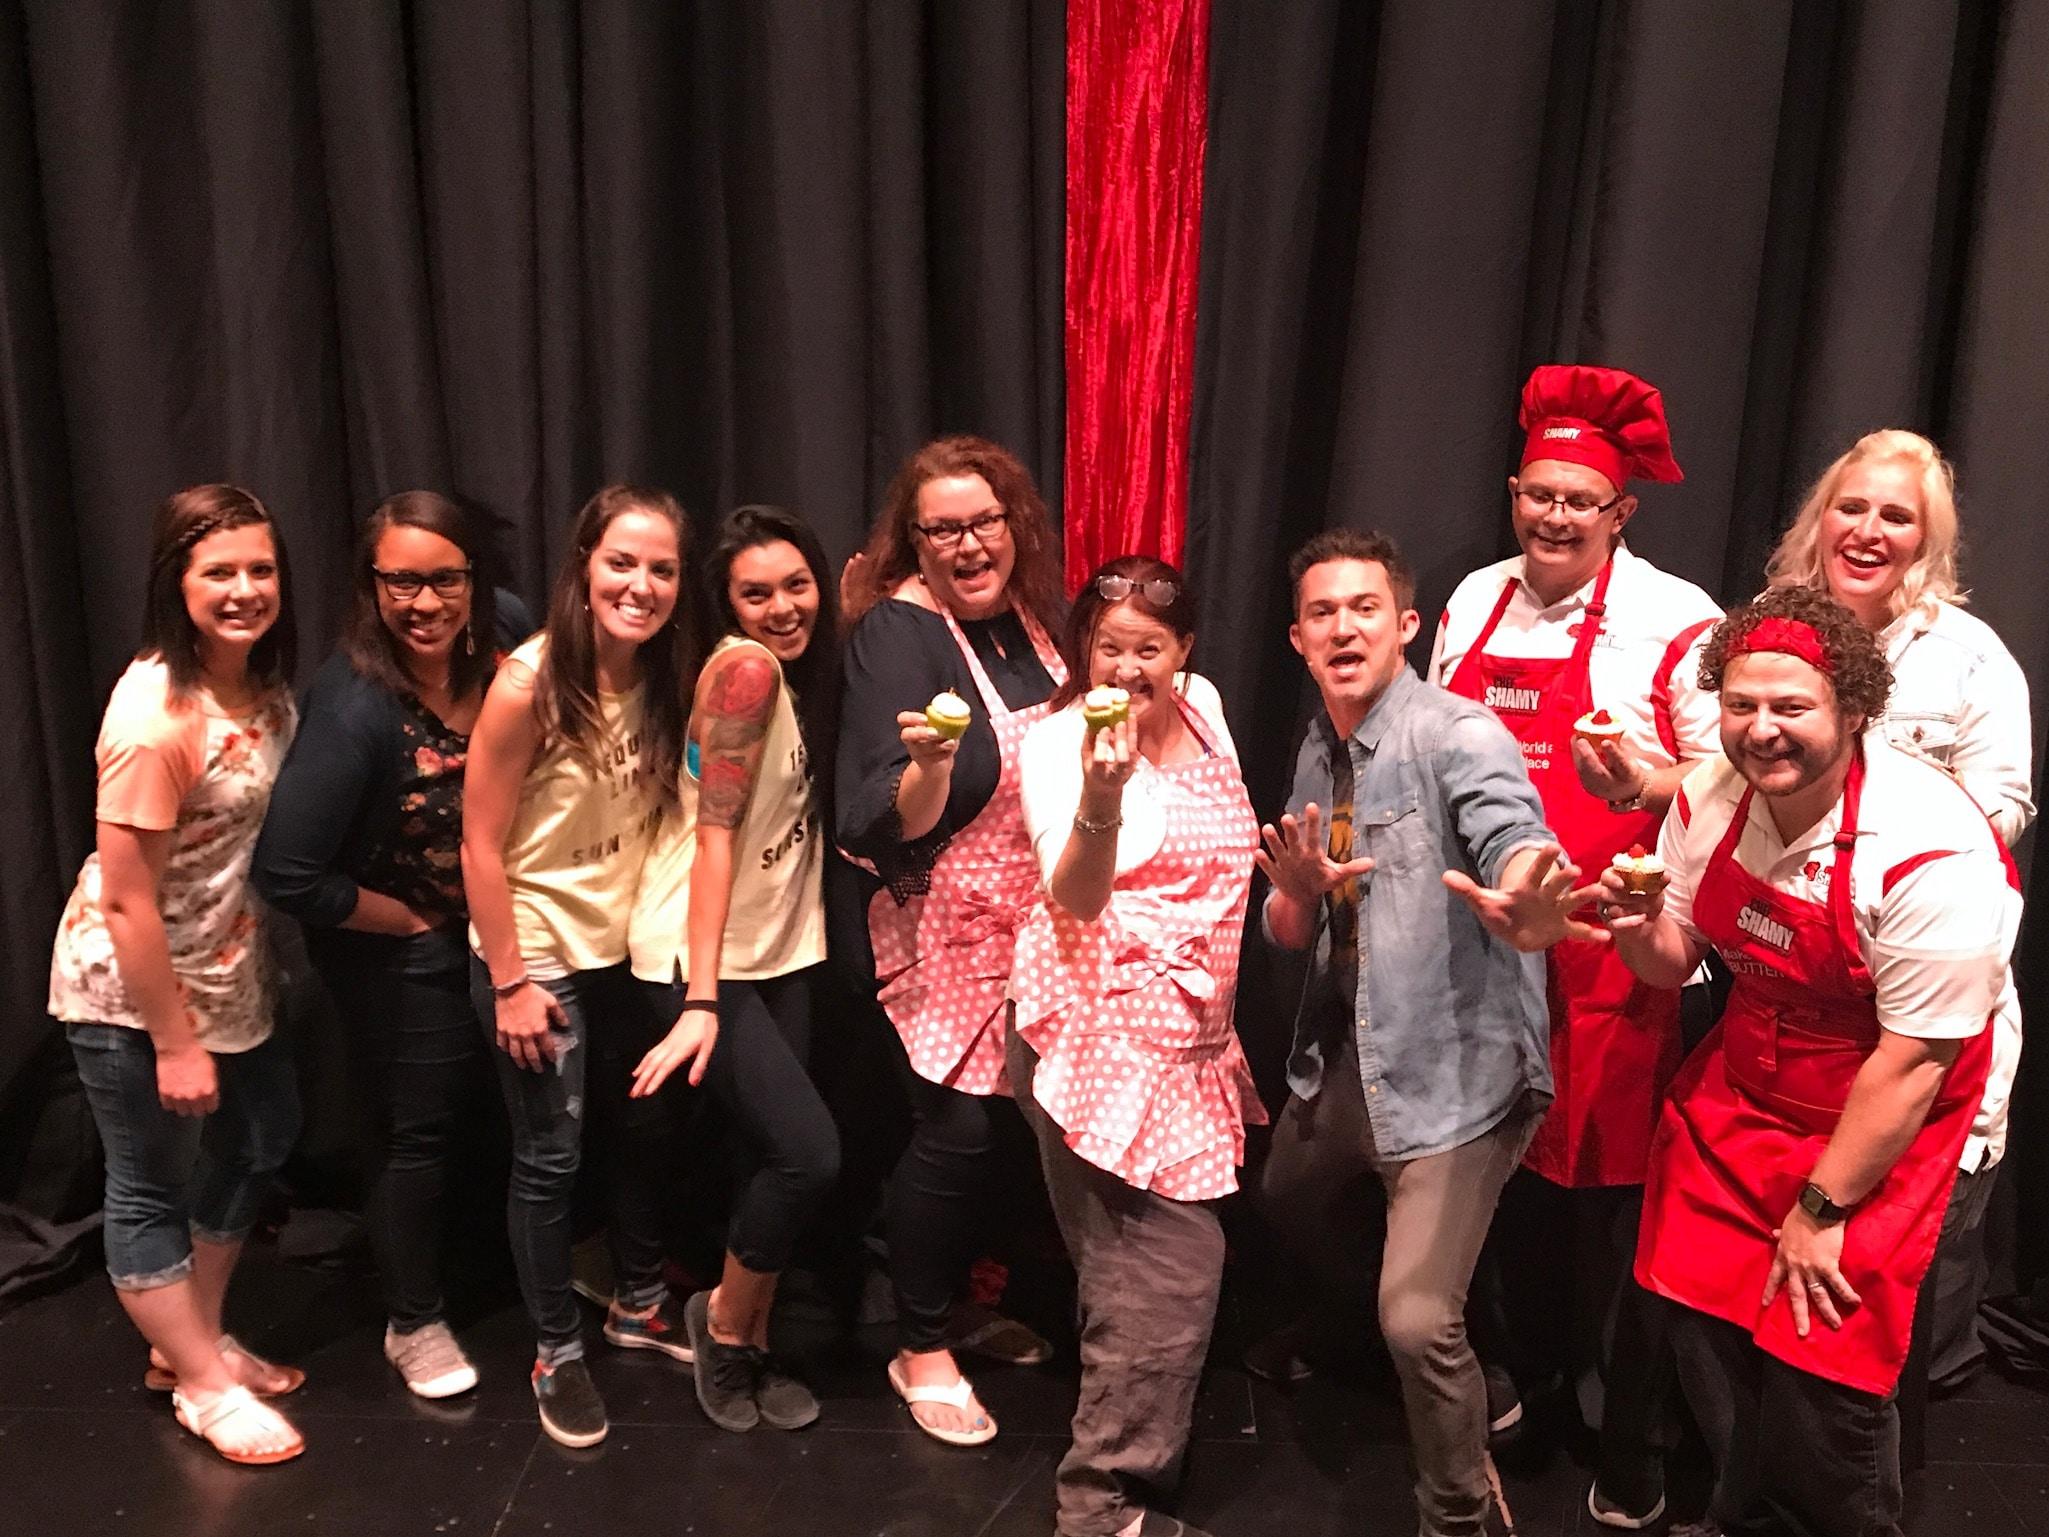 Jessica Stier Cupcake Wars Competition